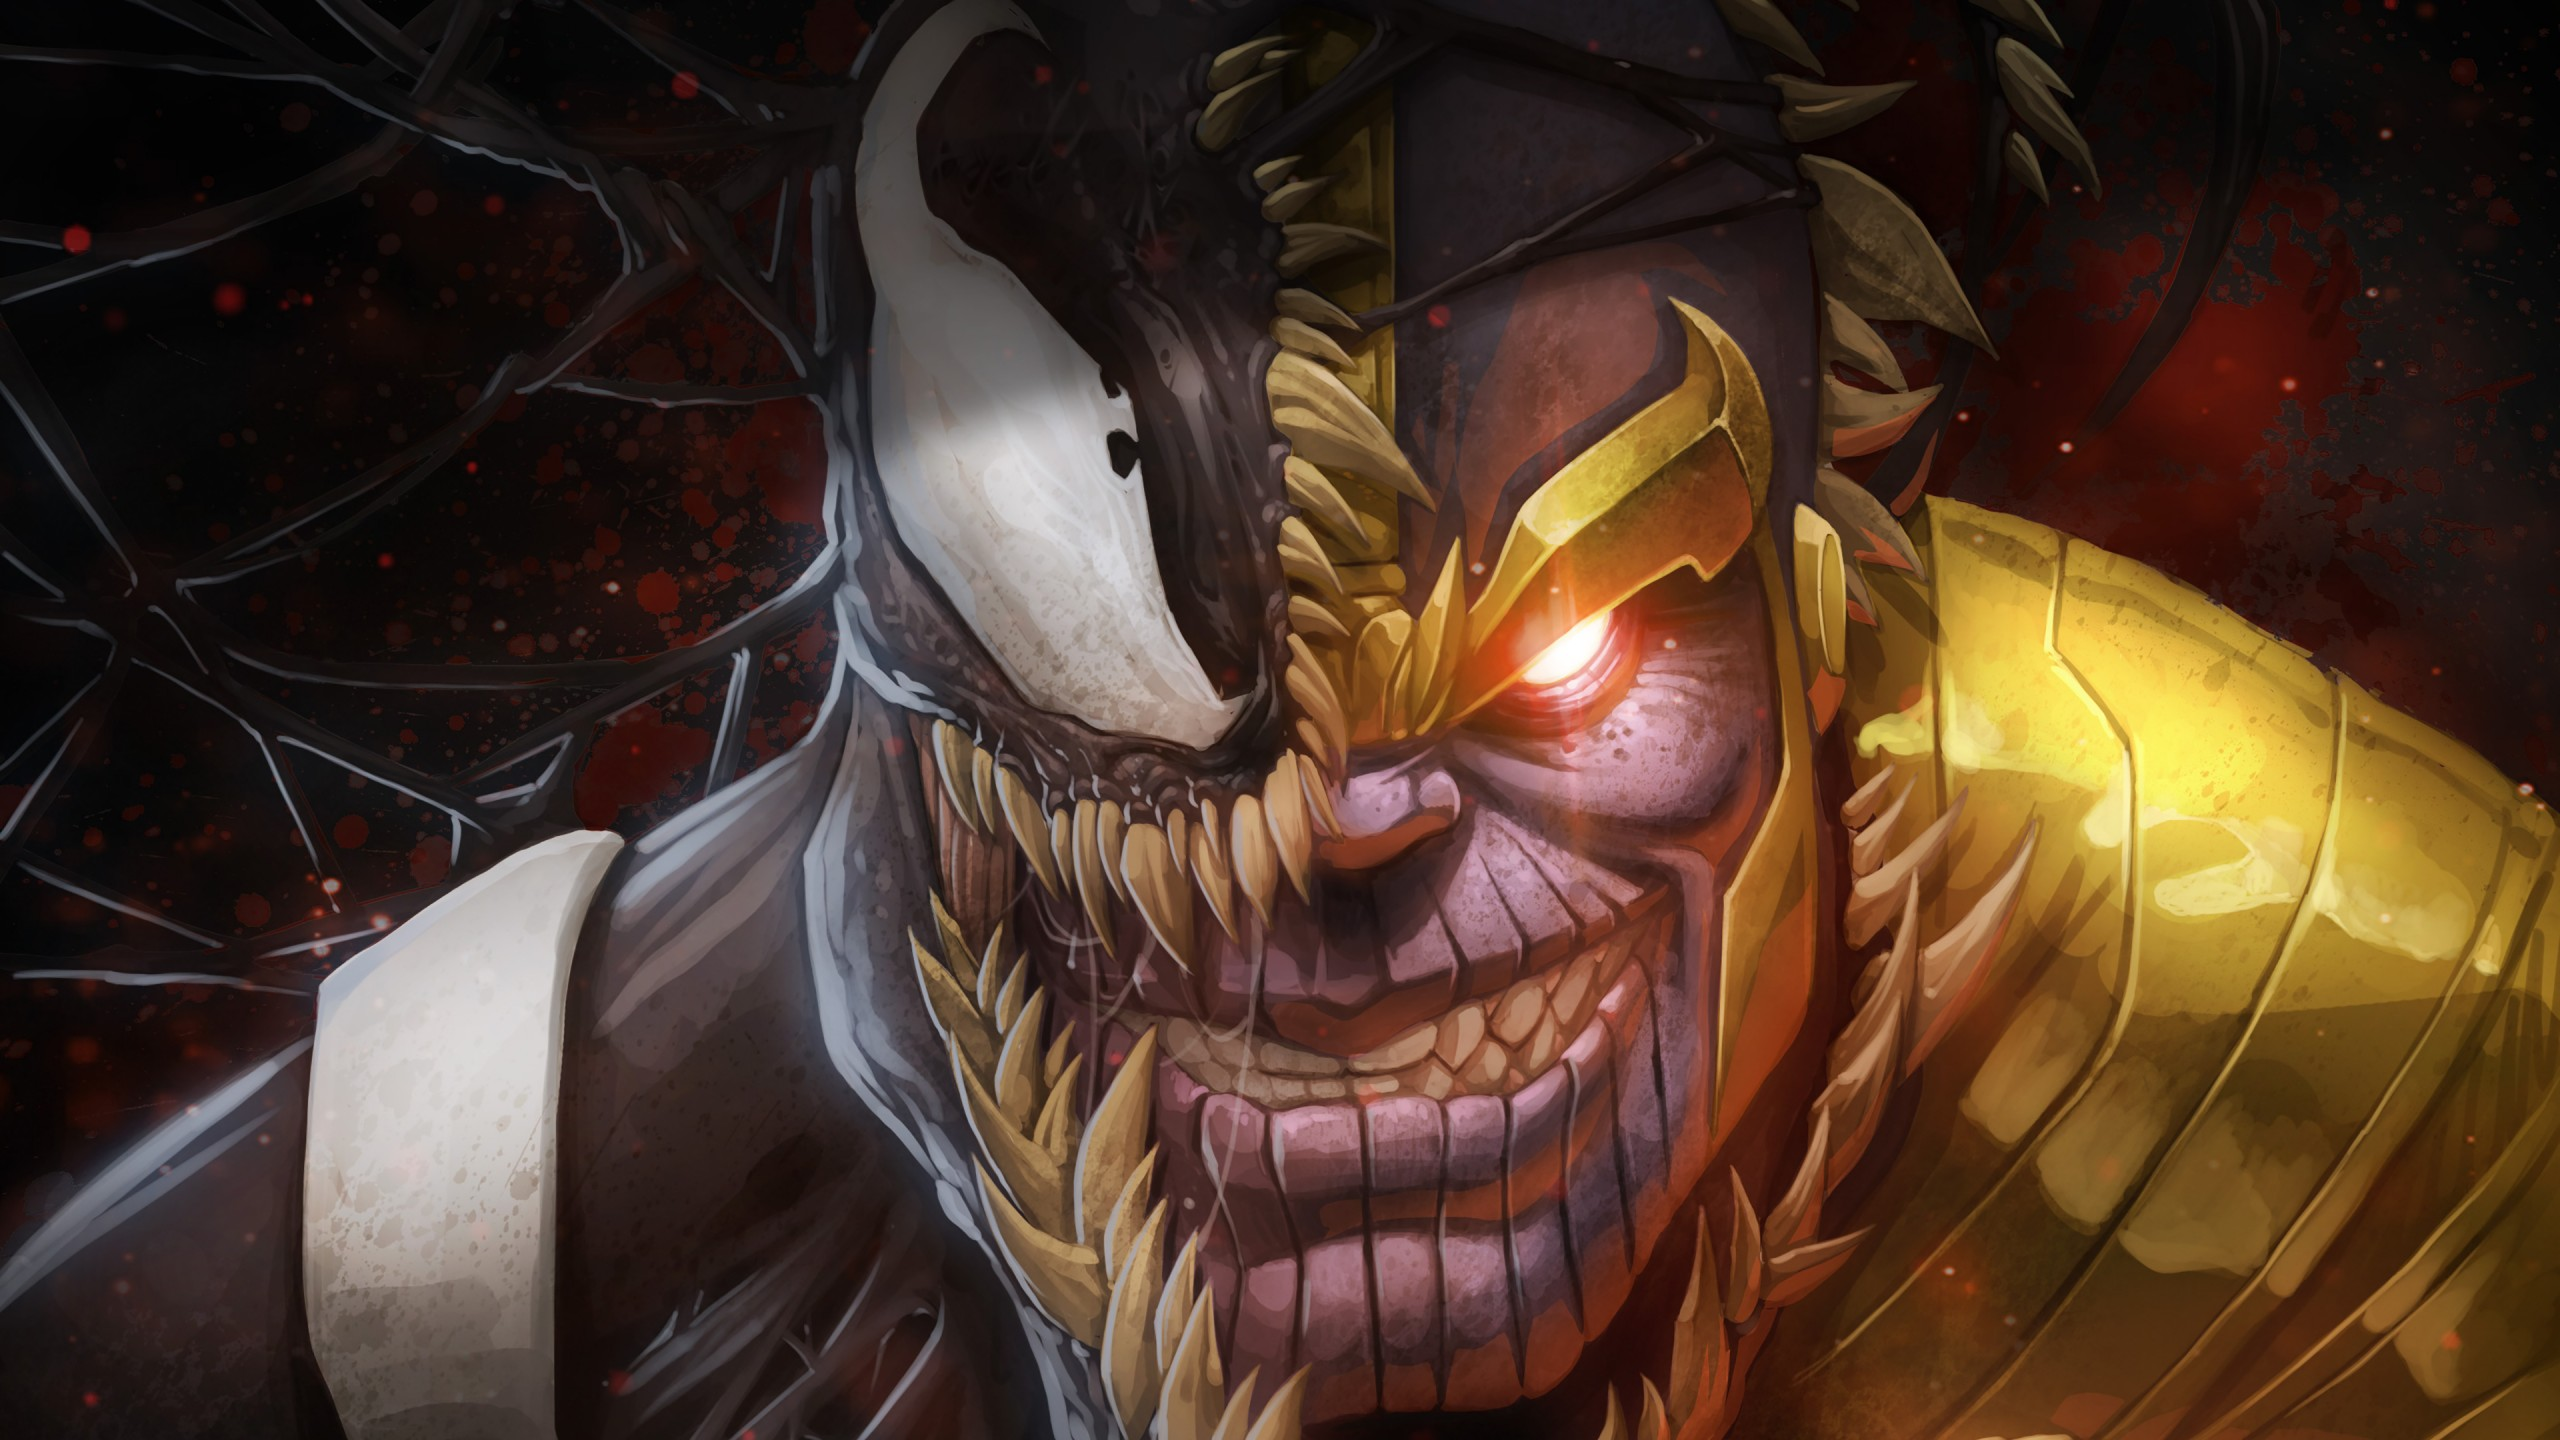 Carnage Wallpaper Hd Thanos Amp Venom Artwork Wallpapers Hd Wallpapers Id 24322